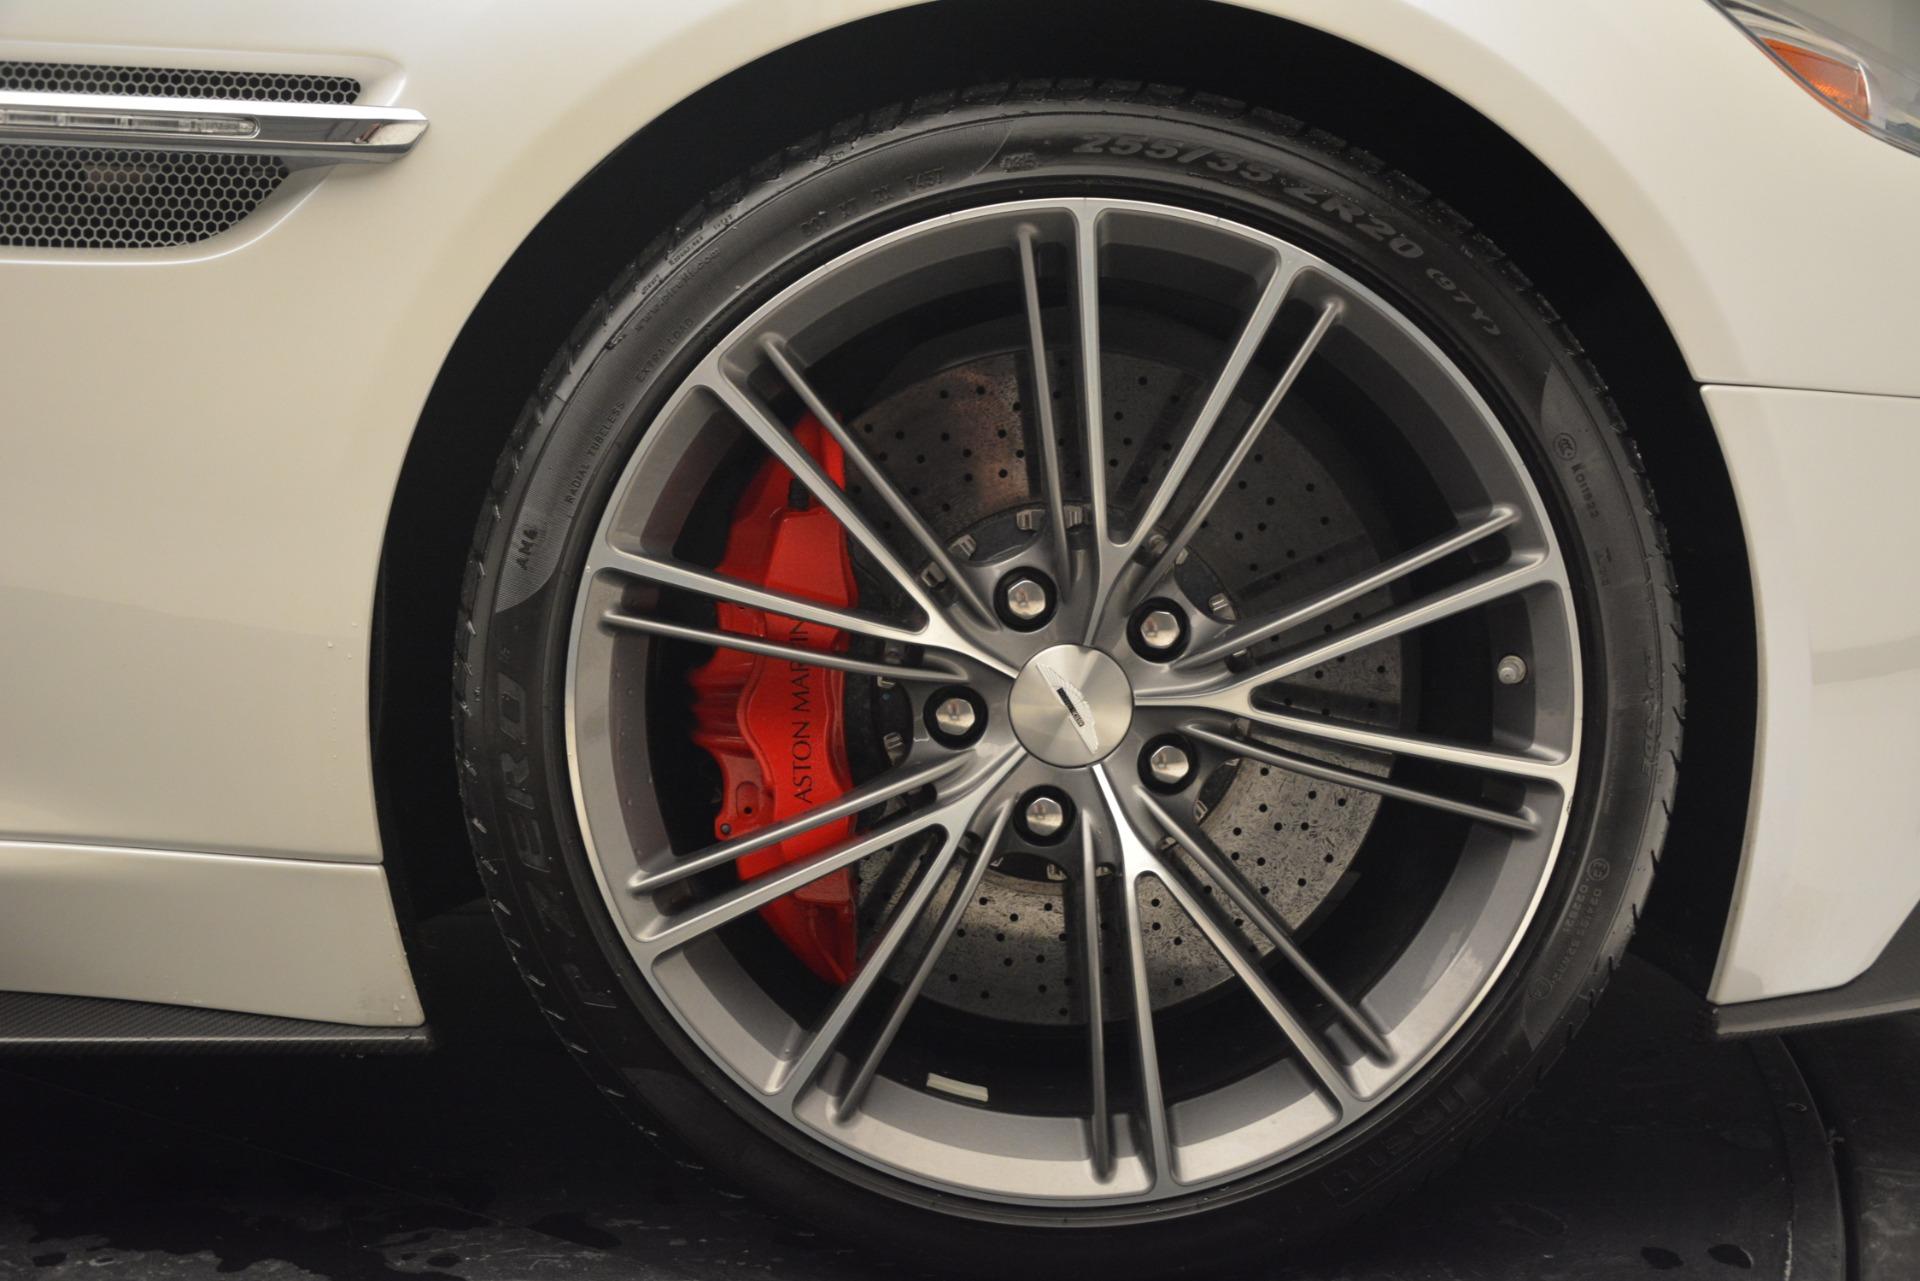 Used 2015 Aston Martin Vanquish Convertible For Sale In Greenwich, CT. Alfa Romeo of Greenwich, 7507 2982_p26